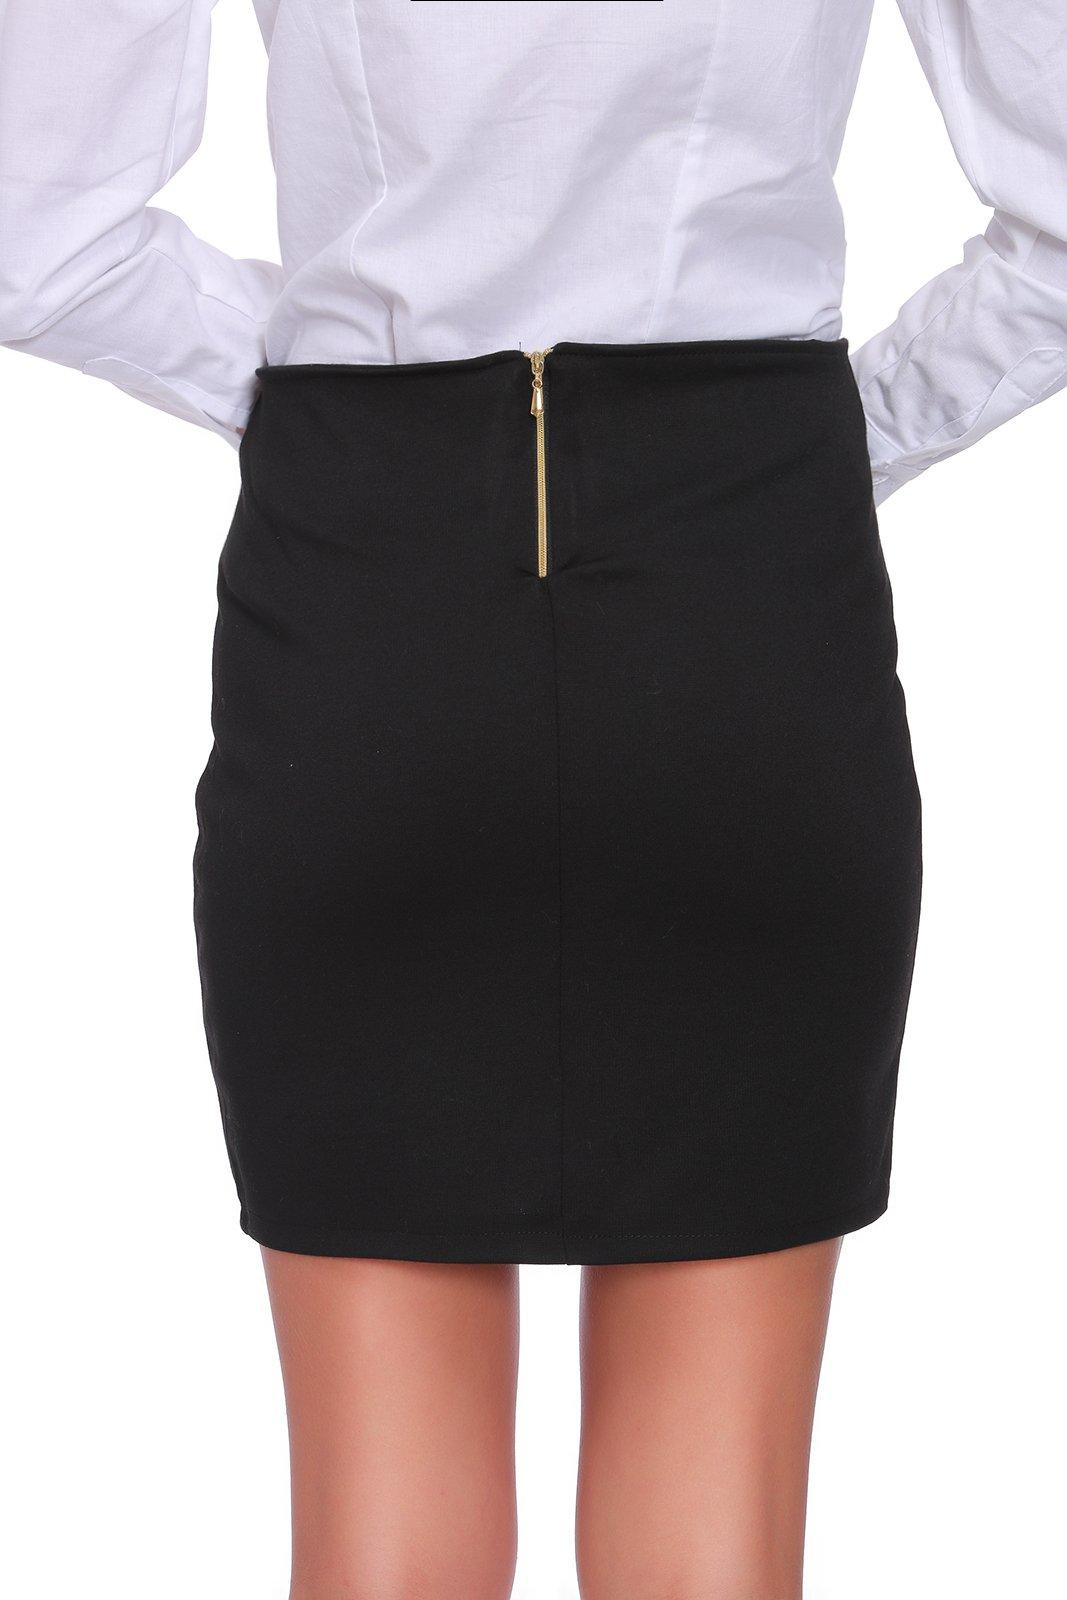 Womens Ladies New Short High Waist Turquoise Wrap Over Zip Pencil Skirt UK 8-16